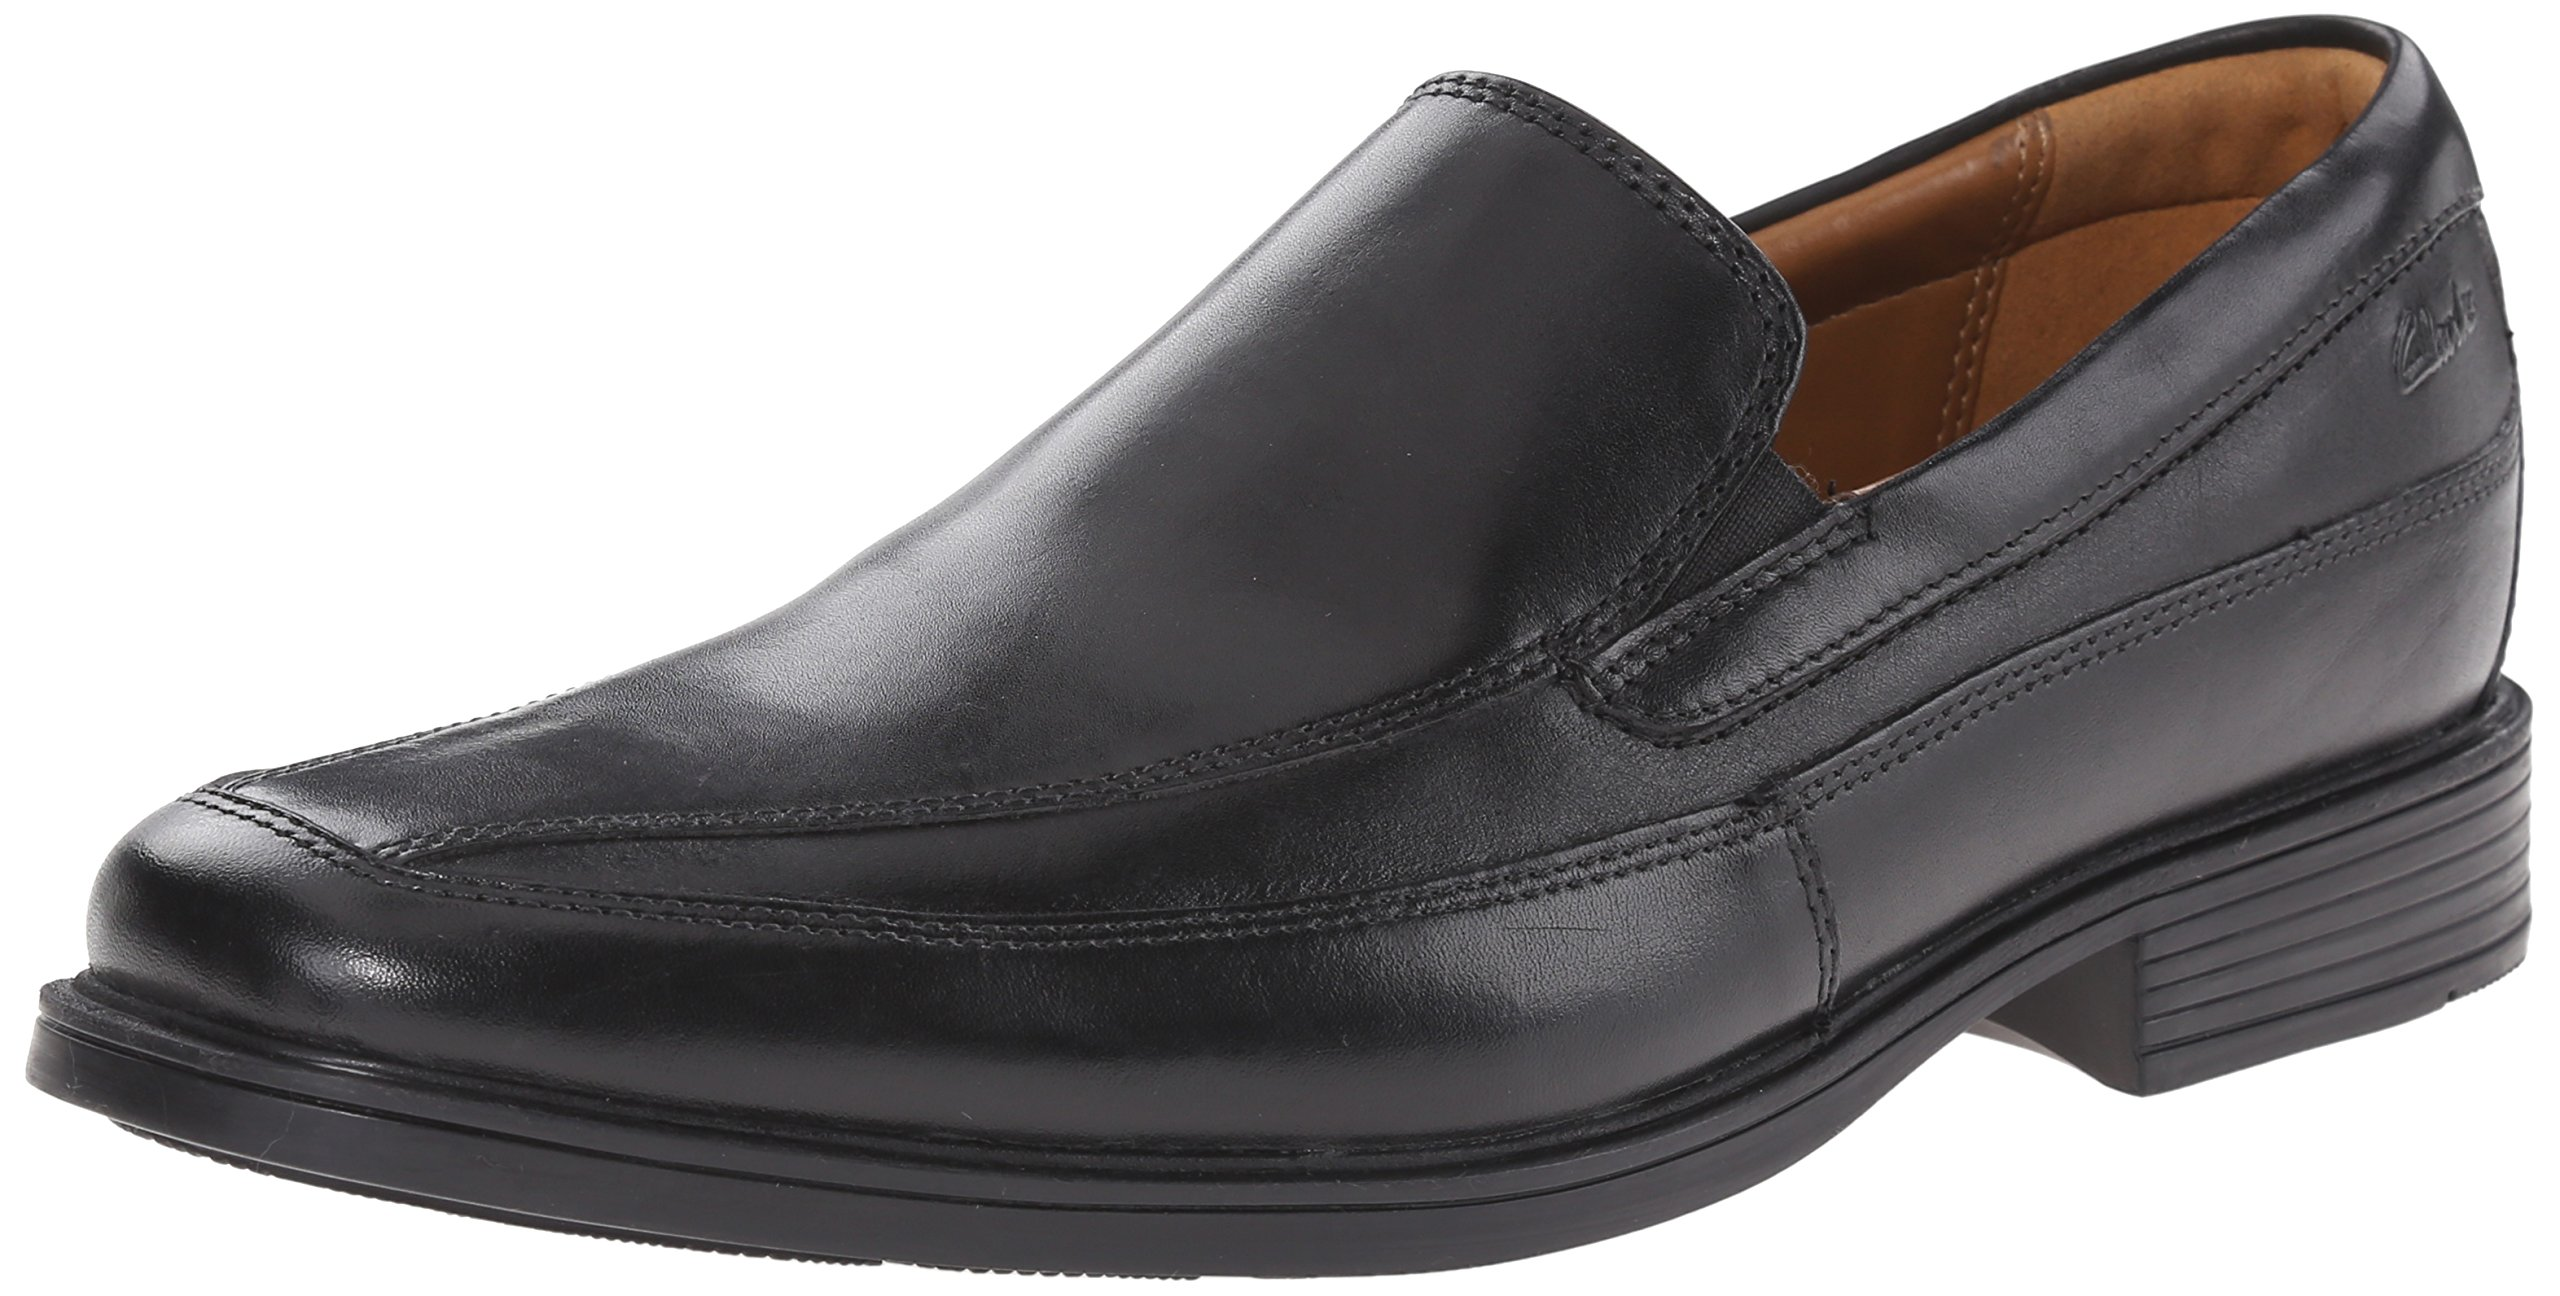 CLARKS Men's Tilden Free Slip-On Loafer, Black Leather, 11 M US